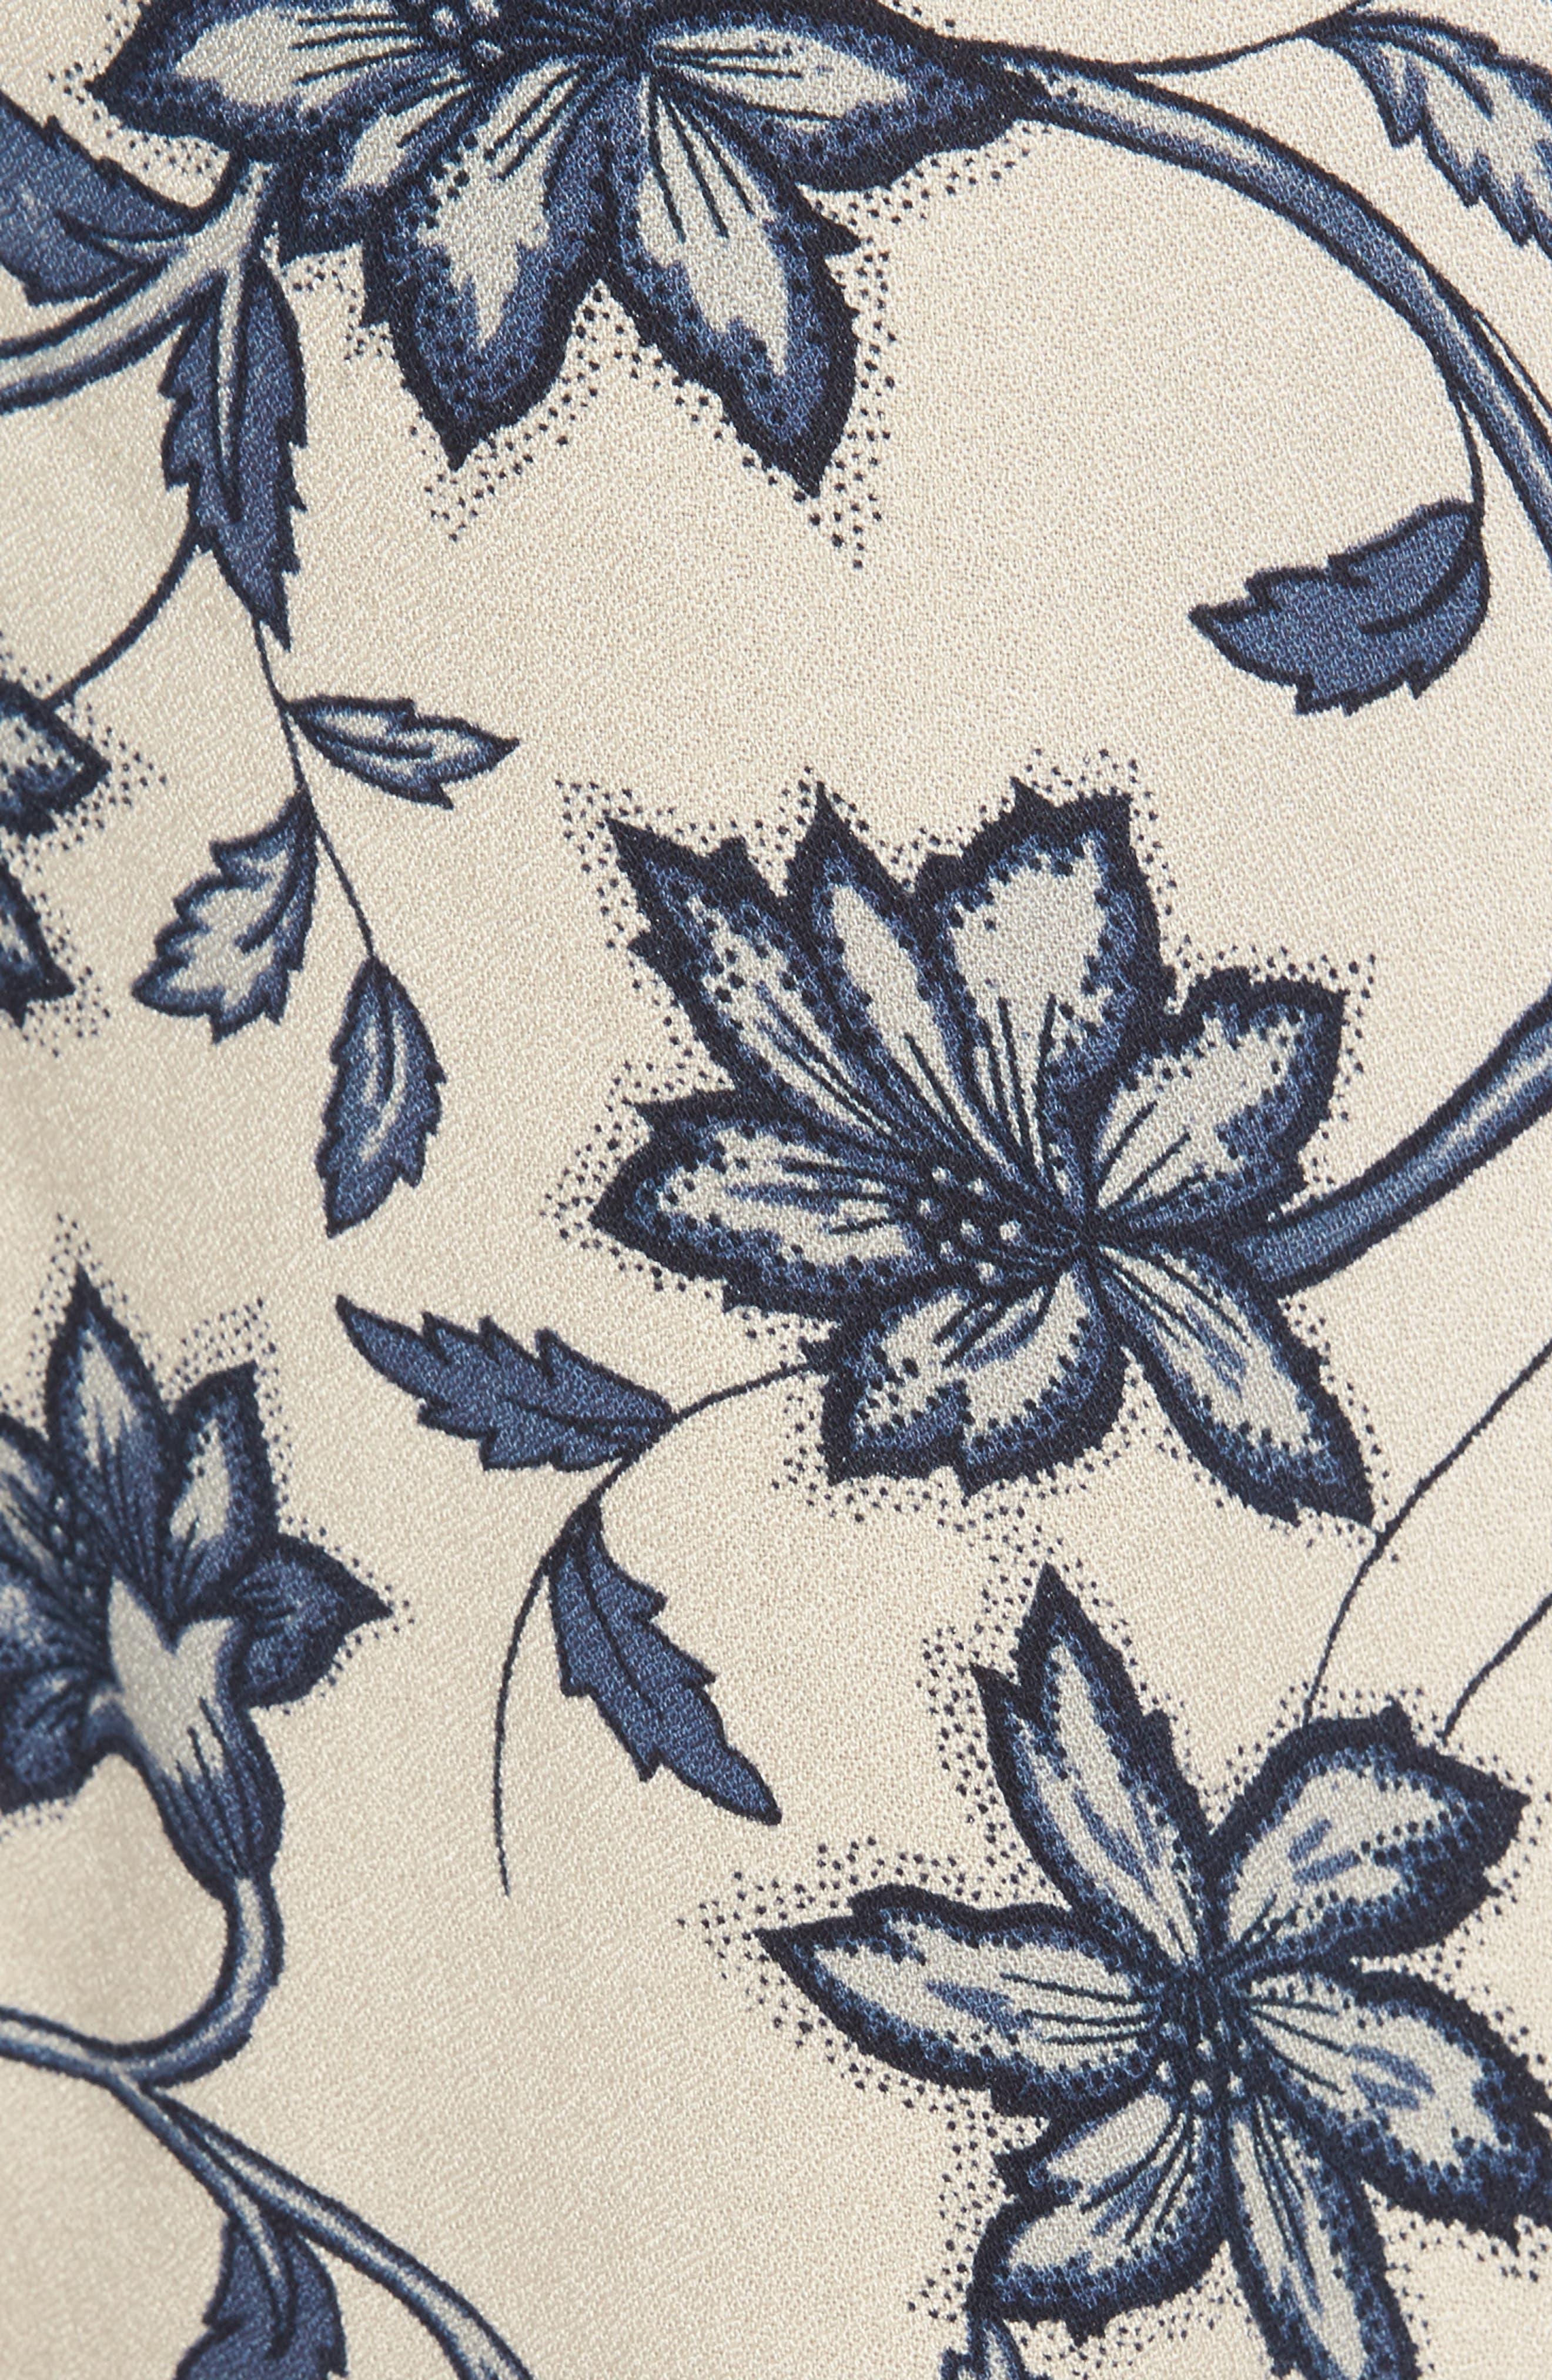 Ruffle Sleeve Blouse,                             Alternate thumbnail 5, color,                             Beige Whisper Burnt Floral